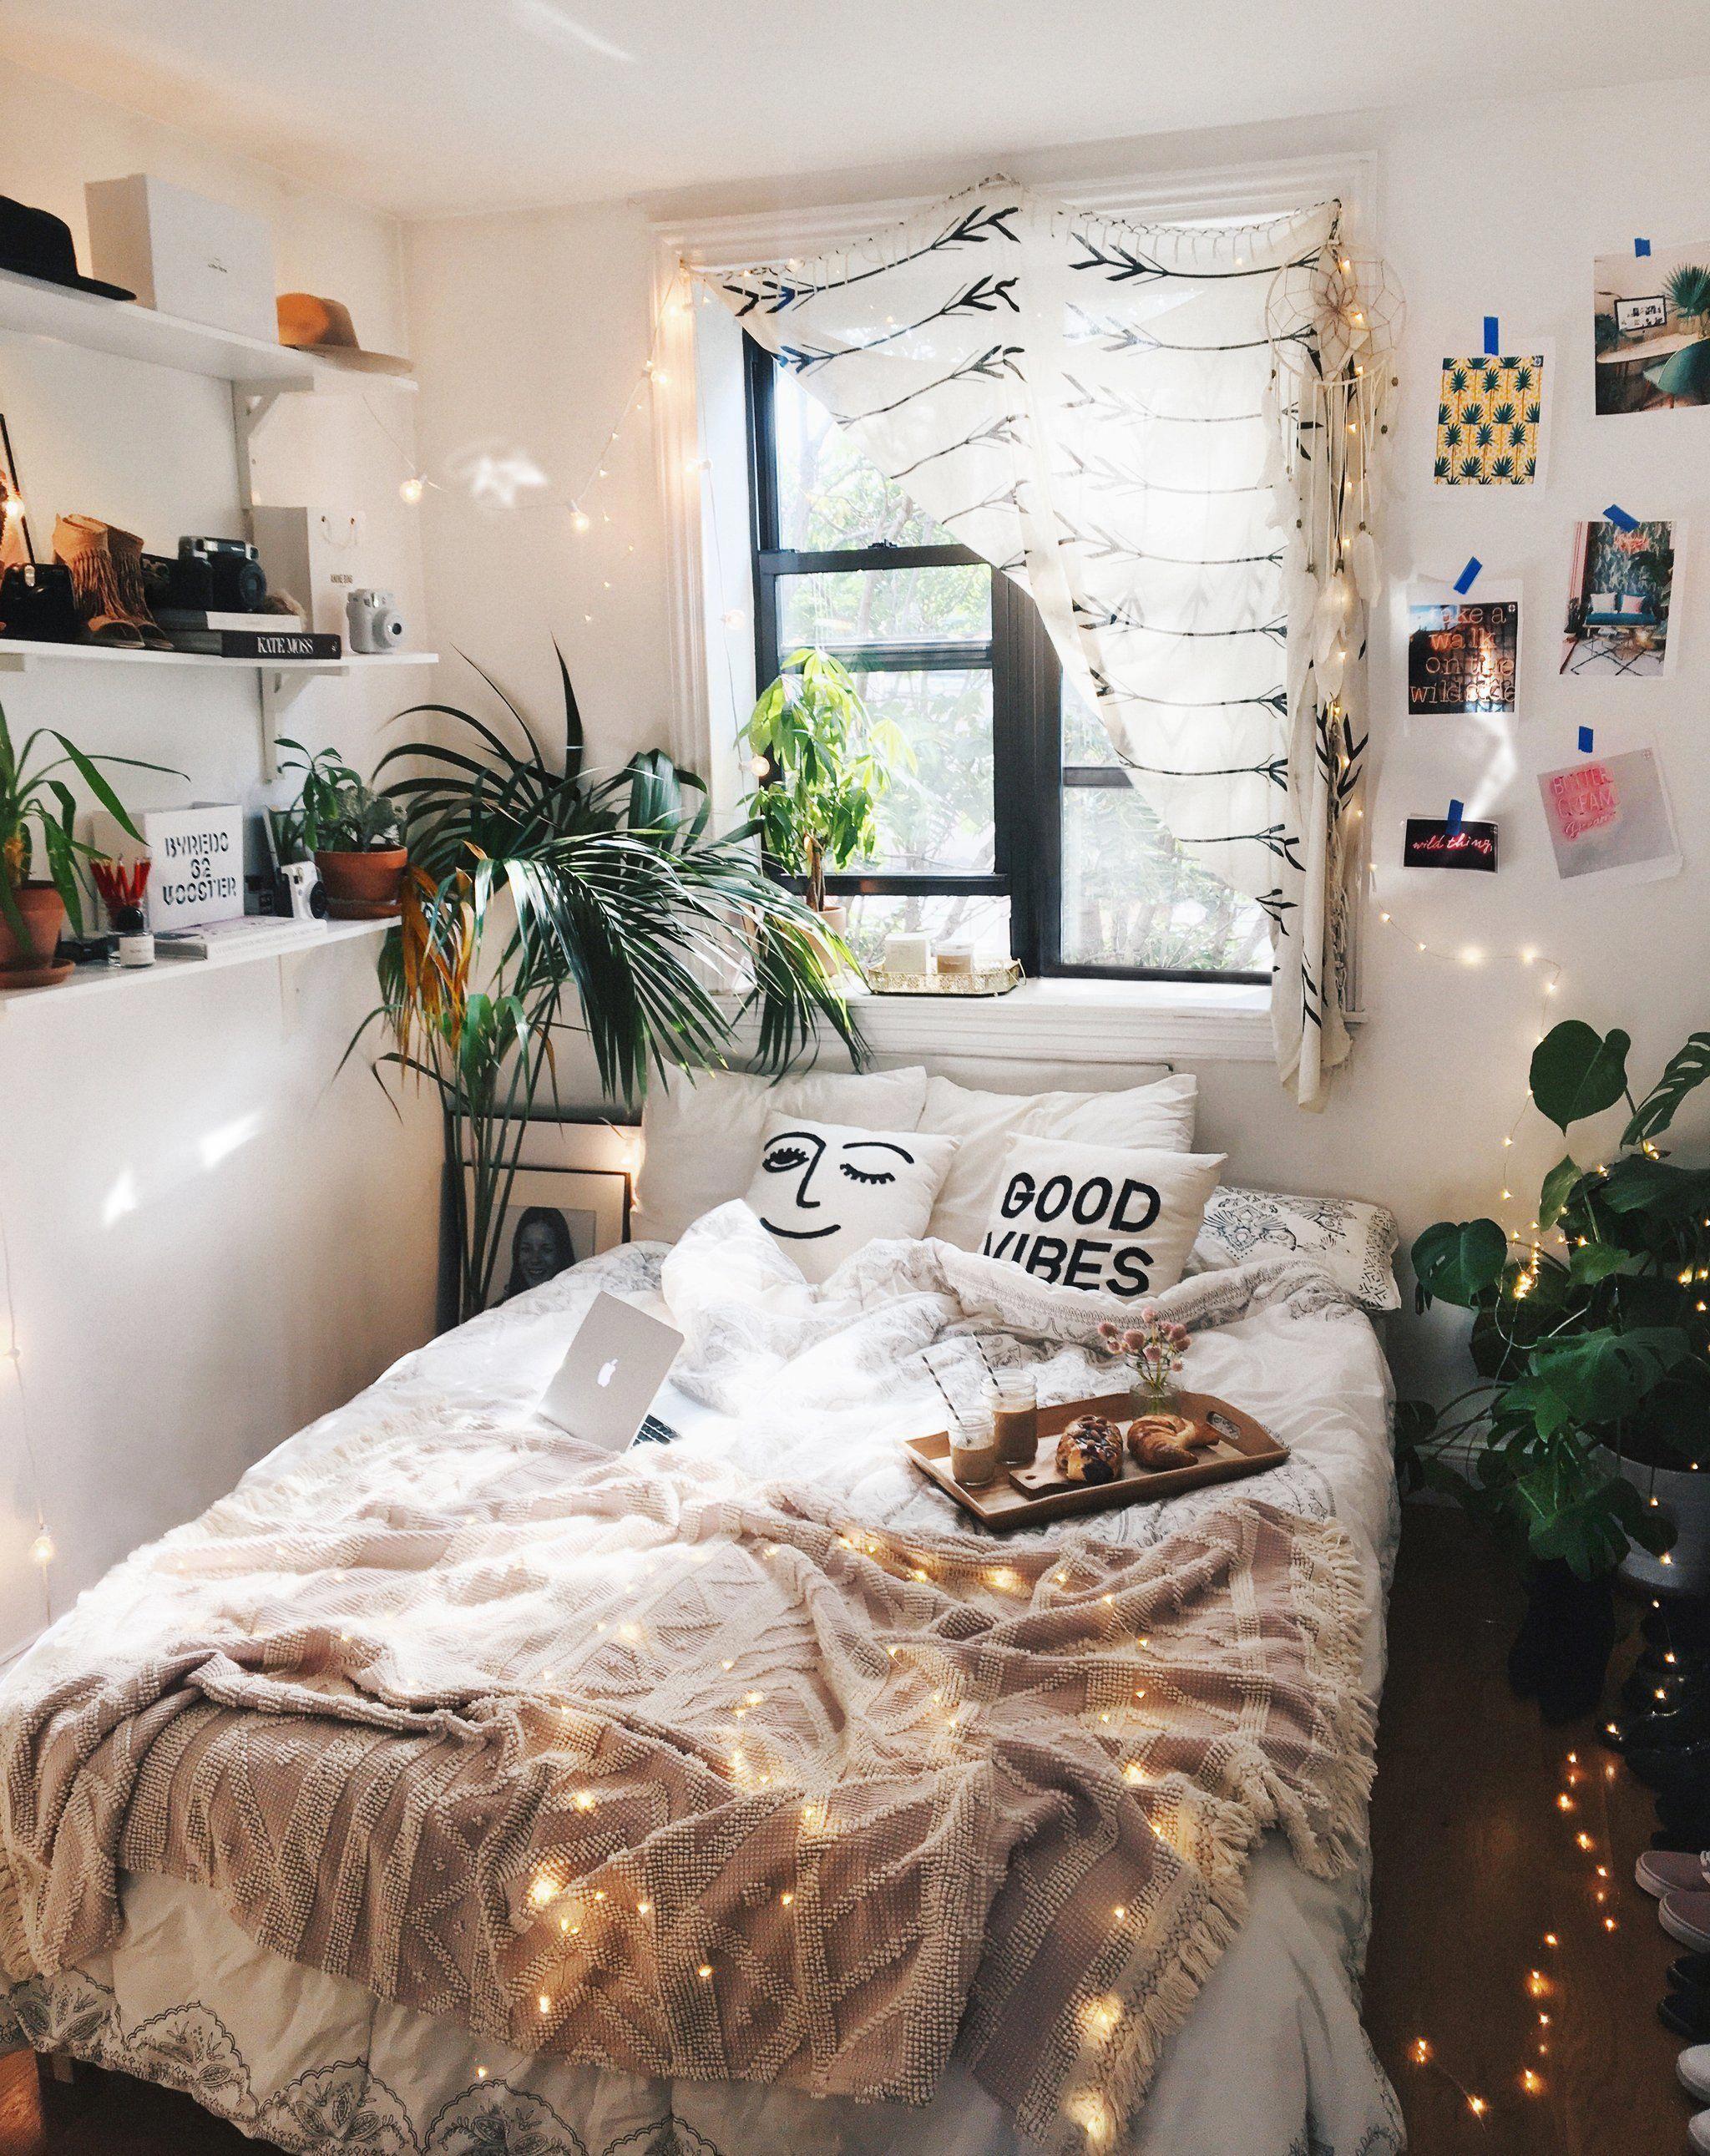 Home Decor Bedroom Jams Homedecorbedroom Dorm Room Decor Stylish Bedroom Design Stylish Bedroom